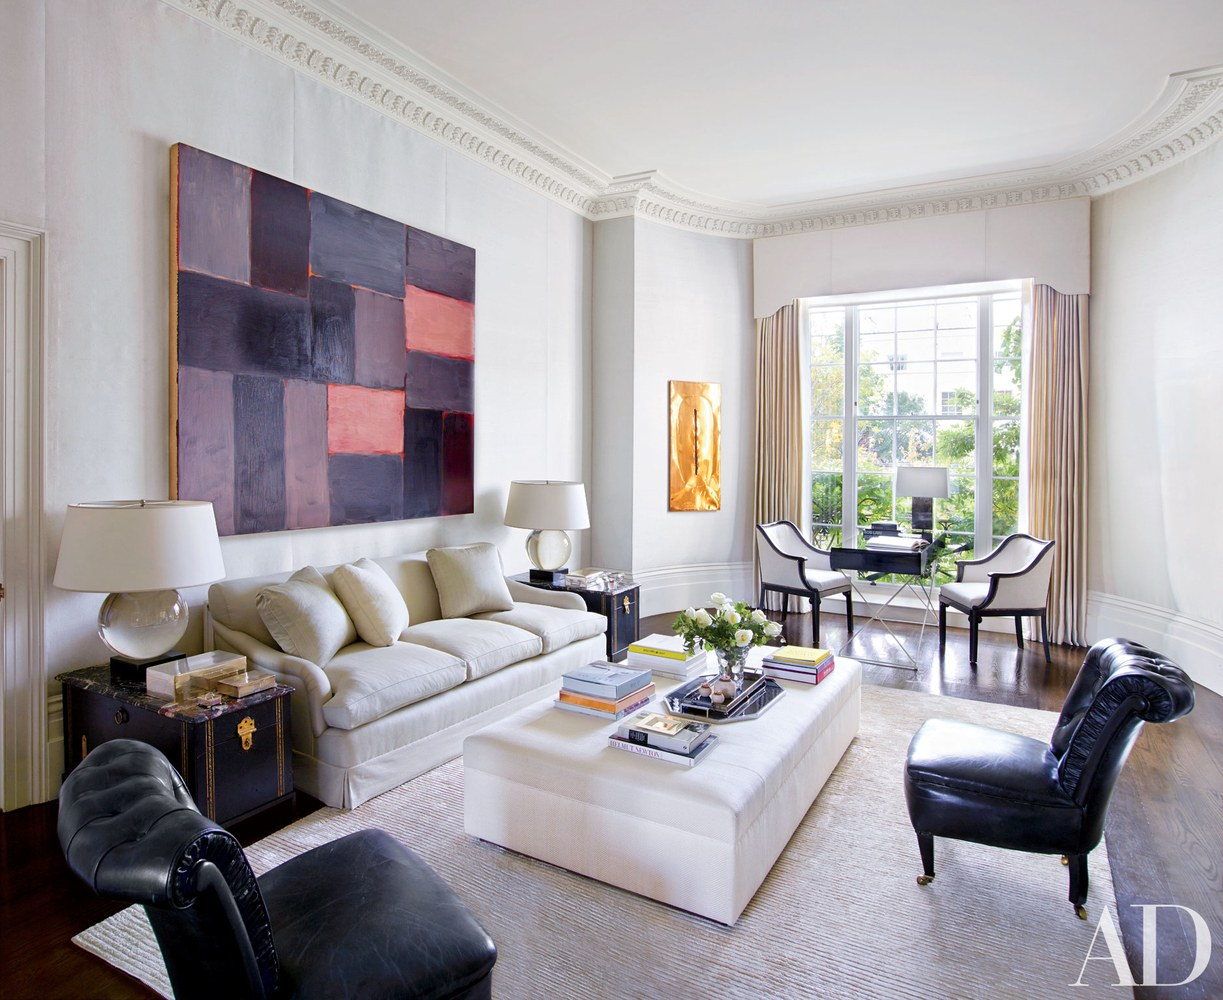 The Leading British Interior Designers By AD100 List – II Part Veere Grenney luxury interiors